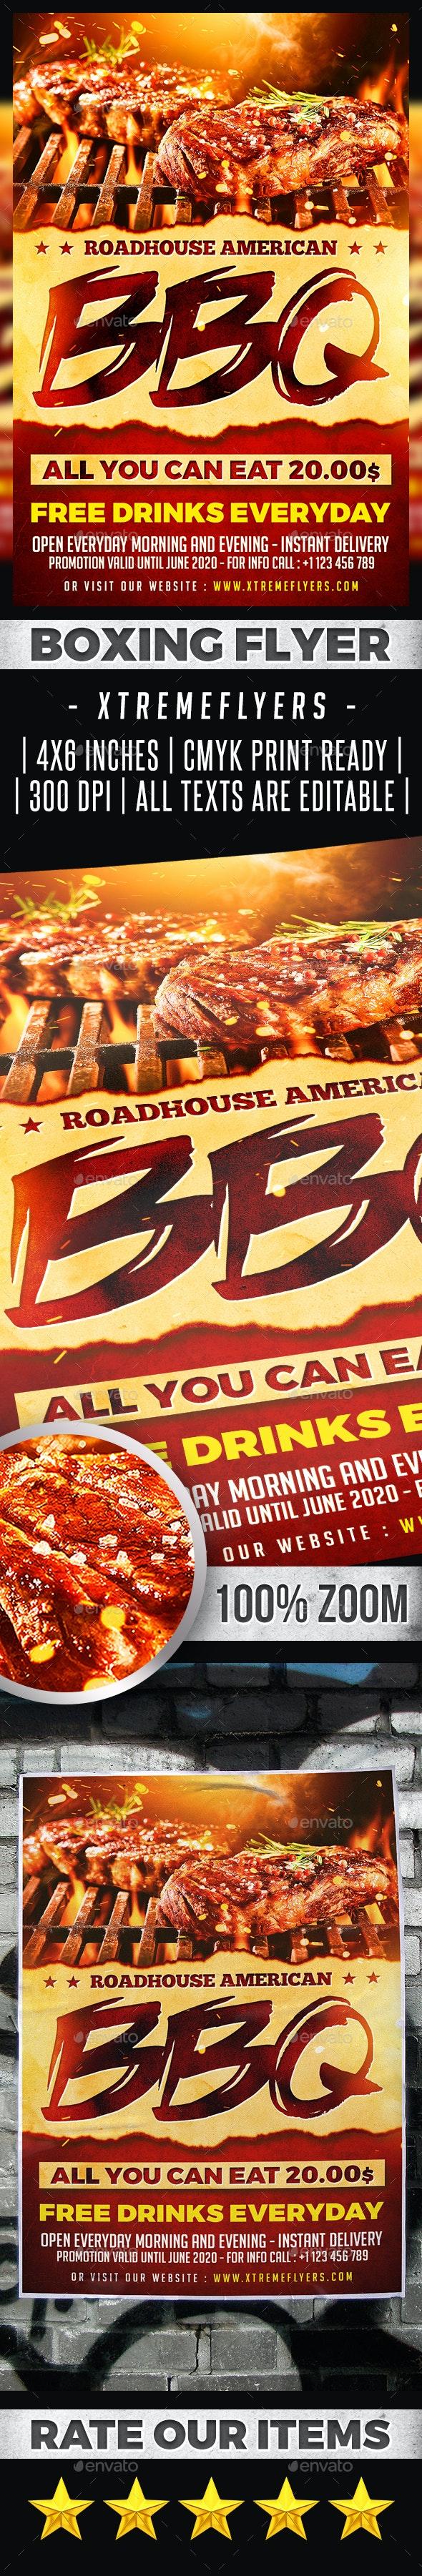 BBQ Steakhouse Flyer - Restaurant Flyers